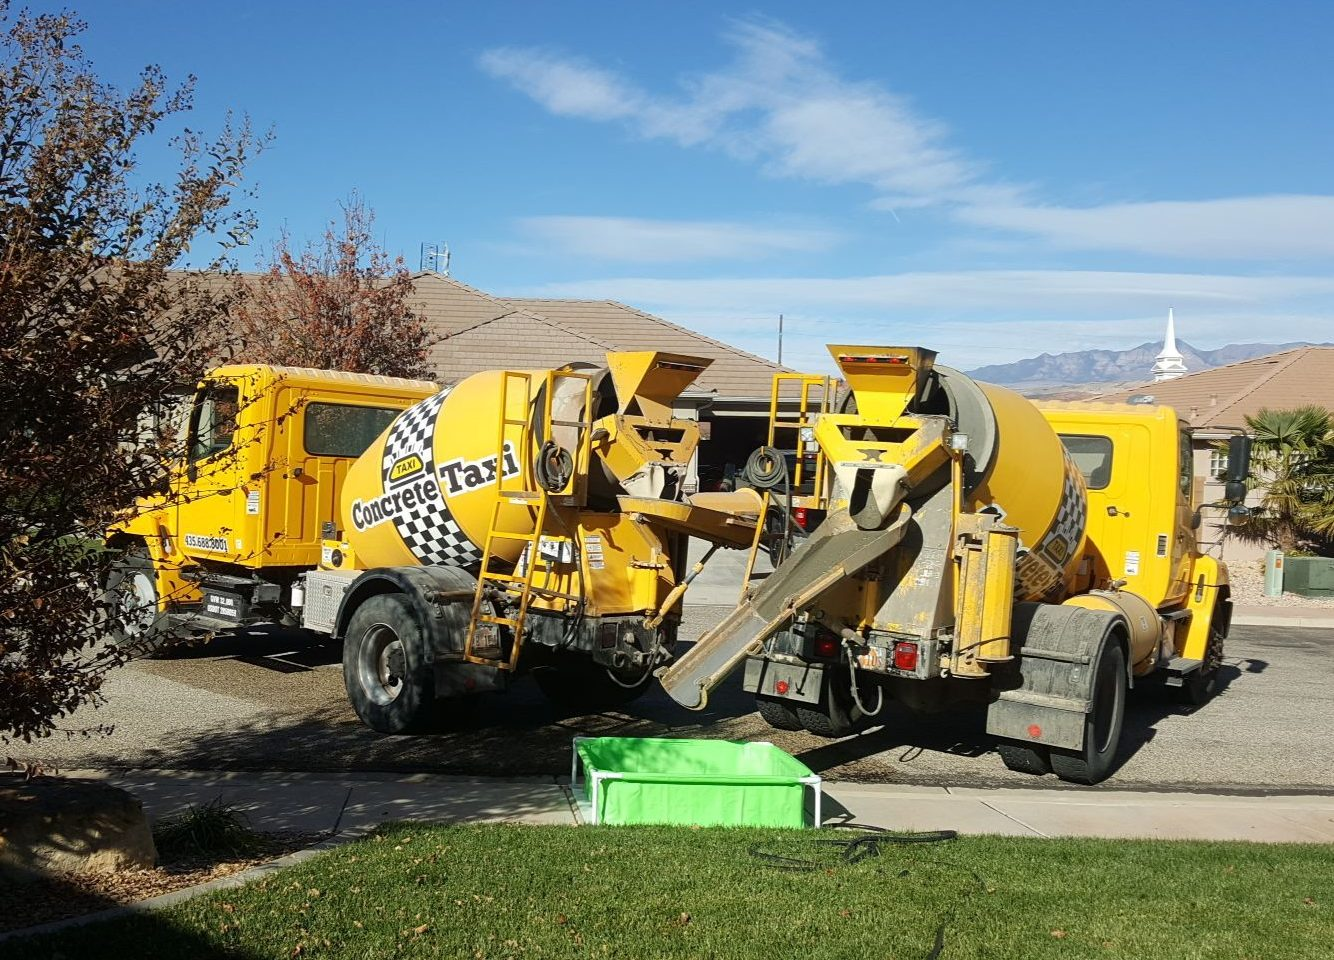 Concrete Delivery | St George UT | Concrete Taxi | Small Concrete Mixer